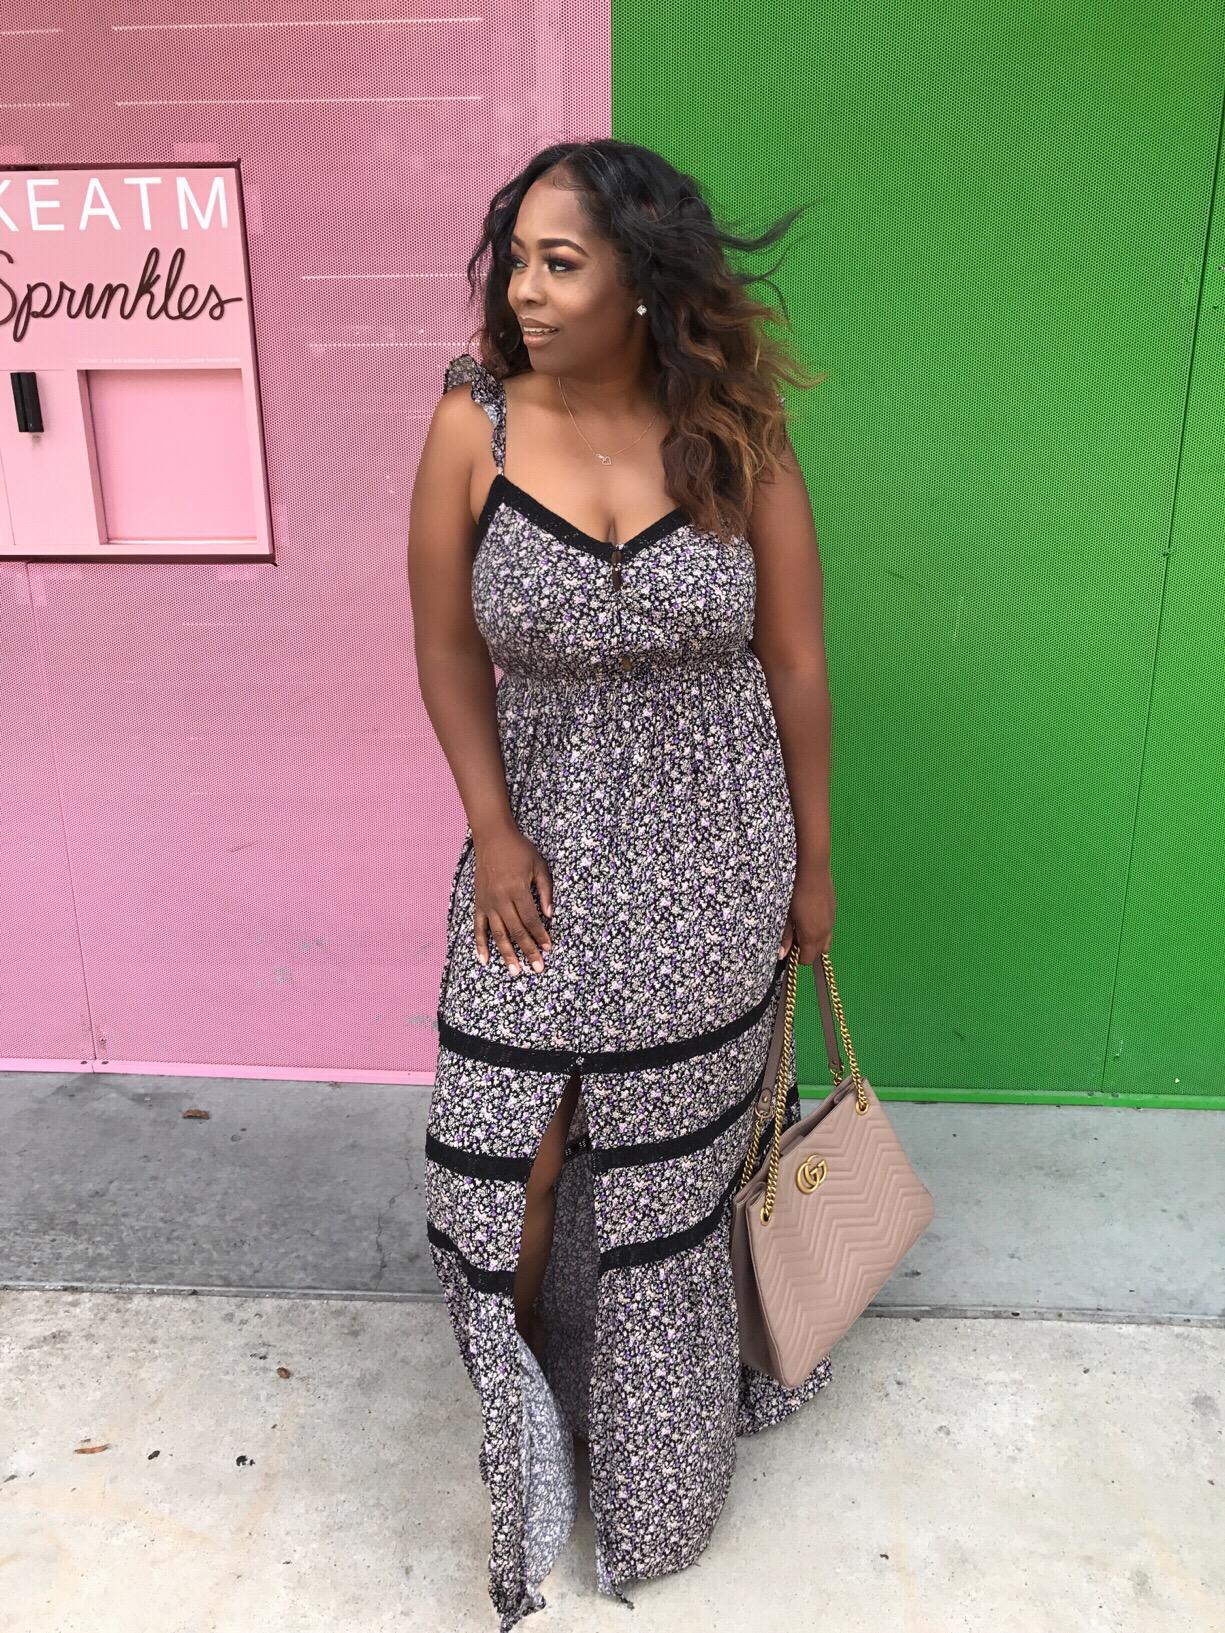 My Style: Floral Print Maxi Dress